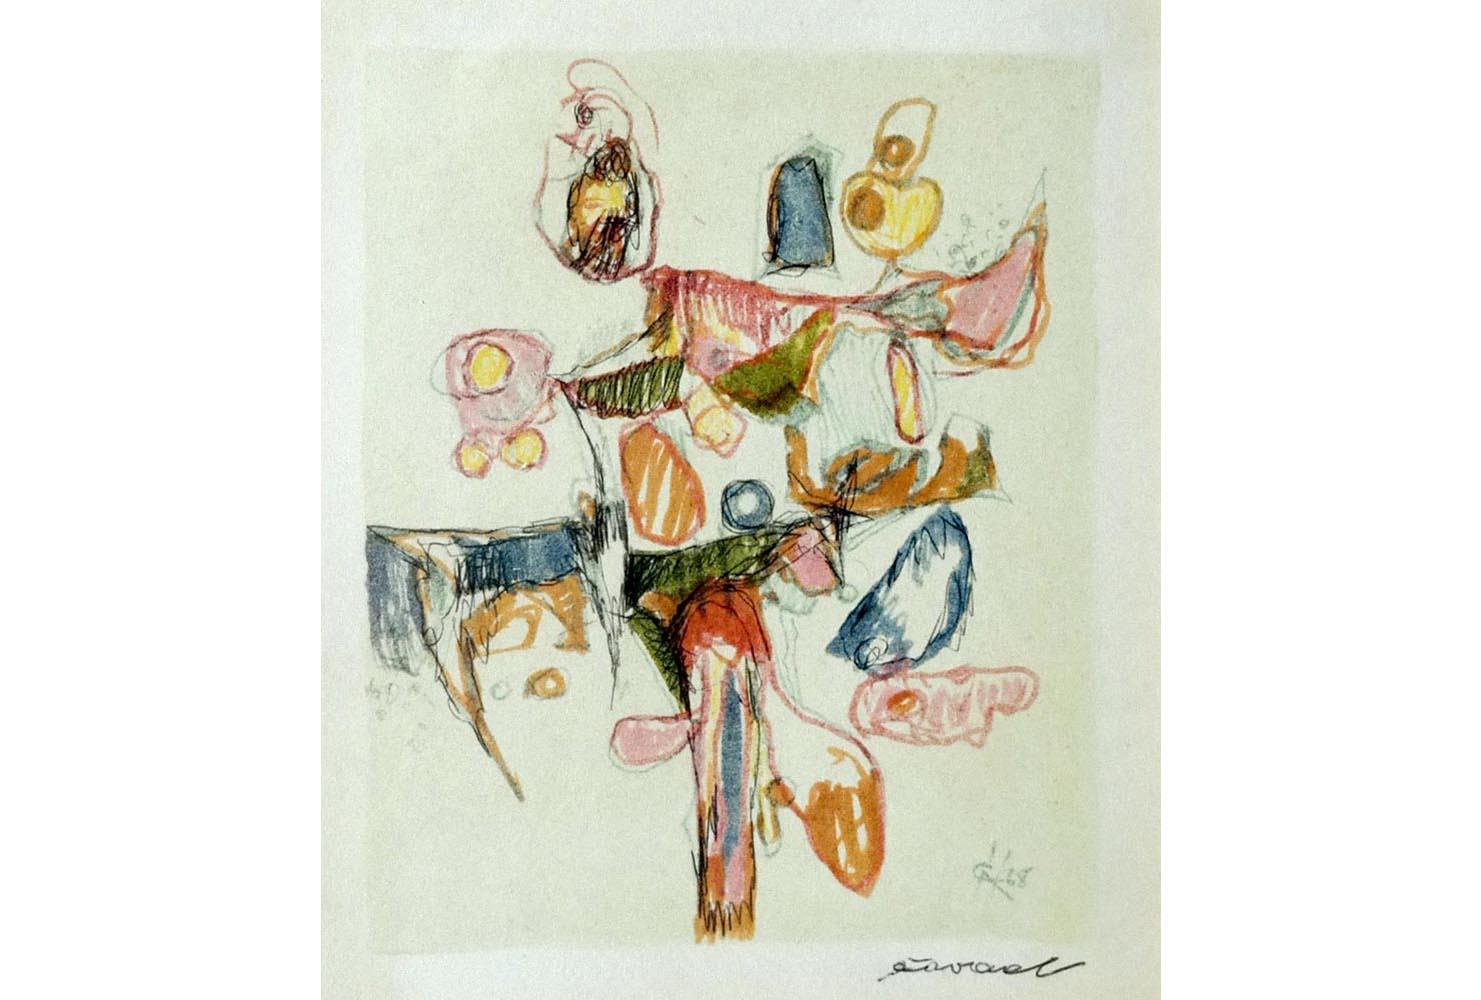 Cavel, Farbzeichnung sign., 17x14 cm, 500€